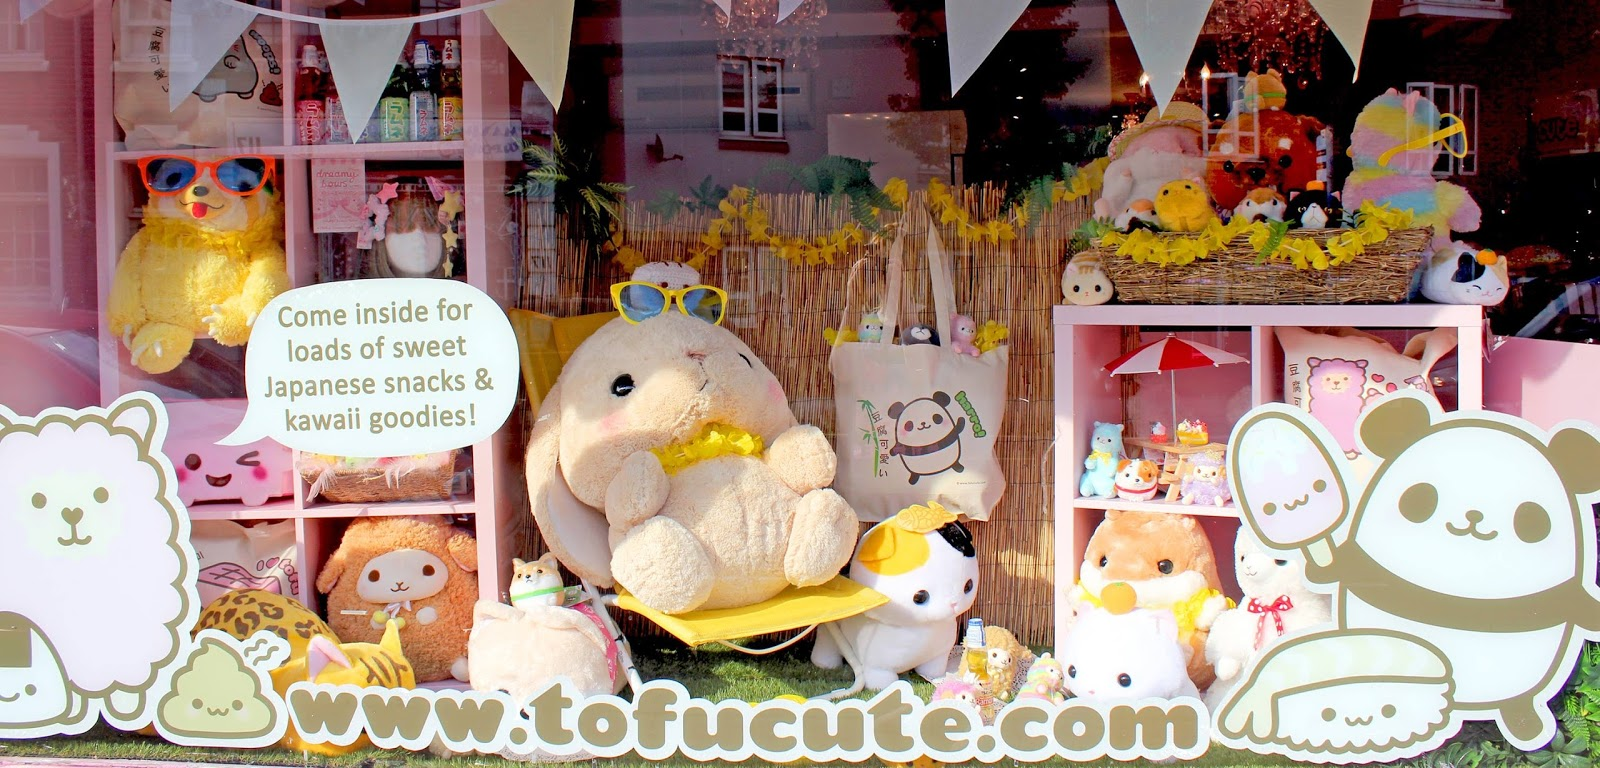 Jfashion store Tofu Cute